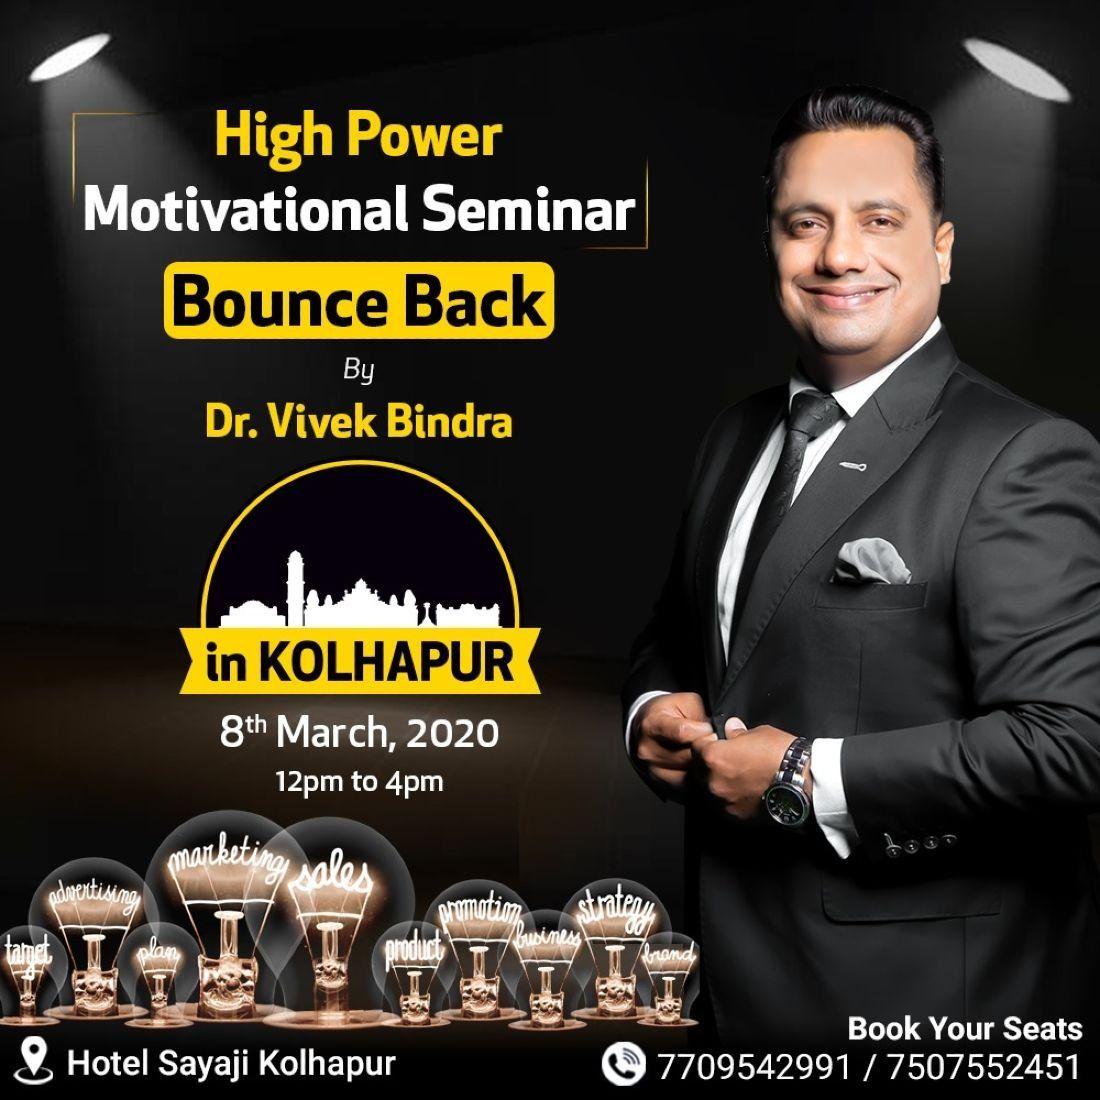 Bounce Back 2.0 Kolhapur By Dr Vivek Bindra